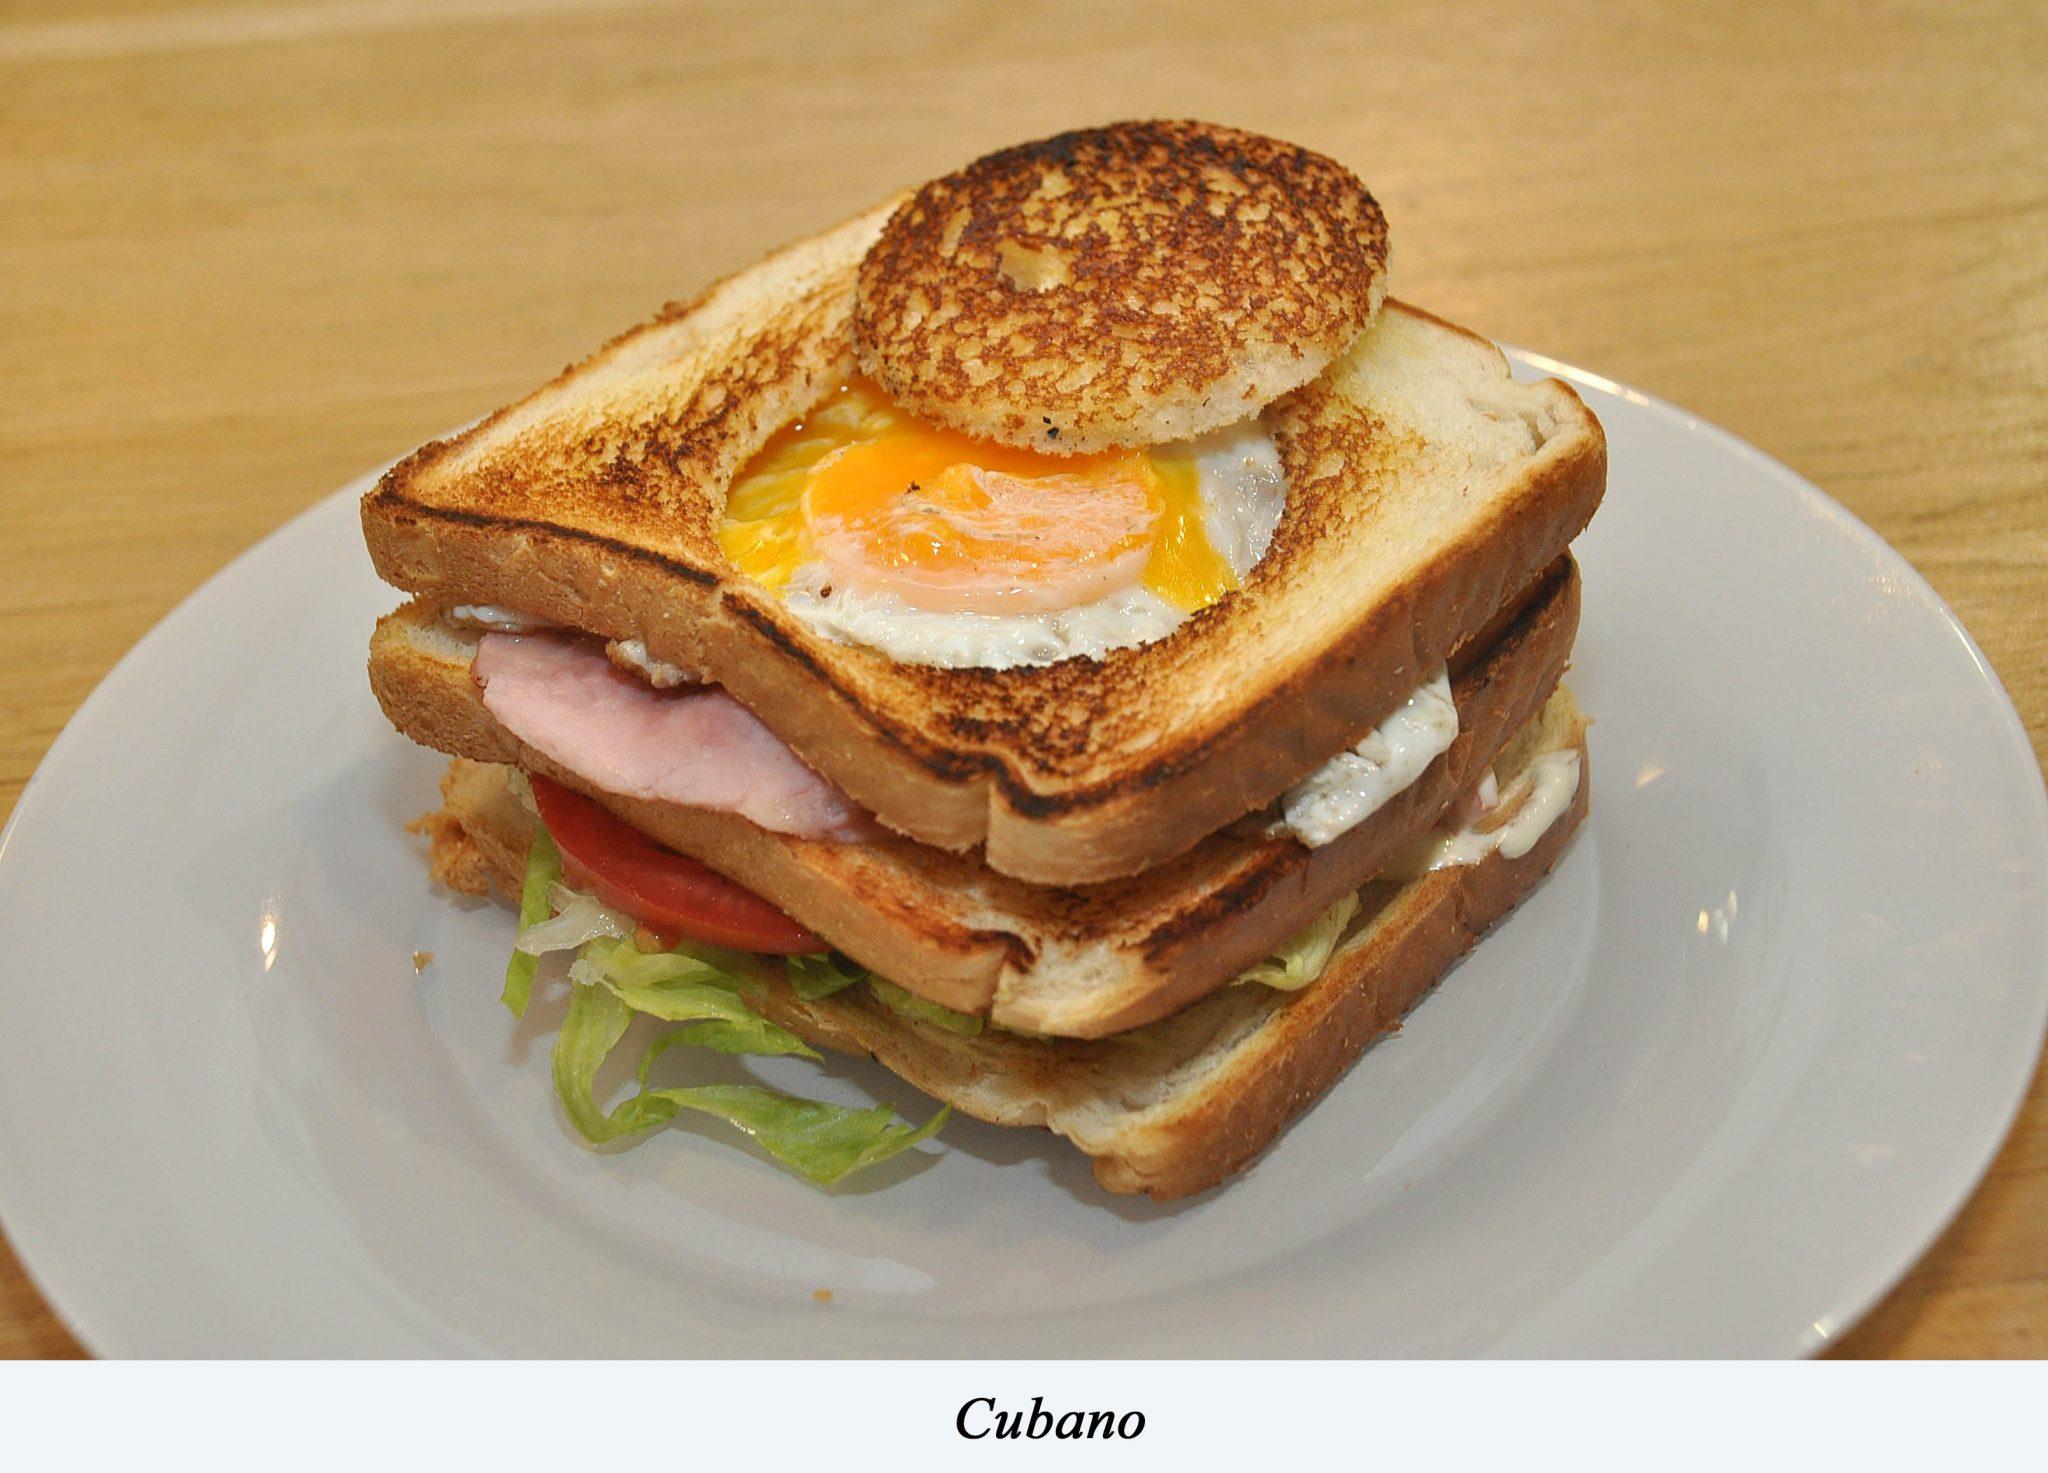 29. Sandwich_Cubano